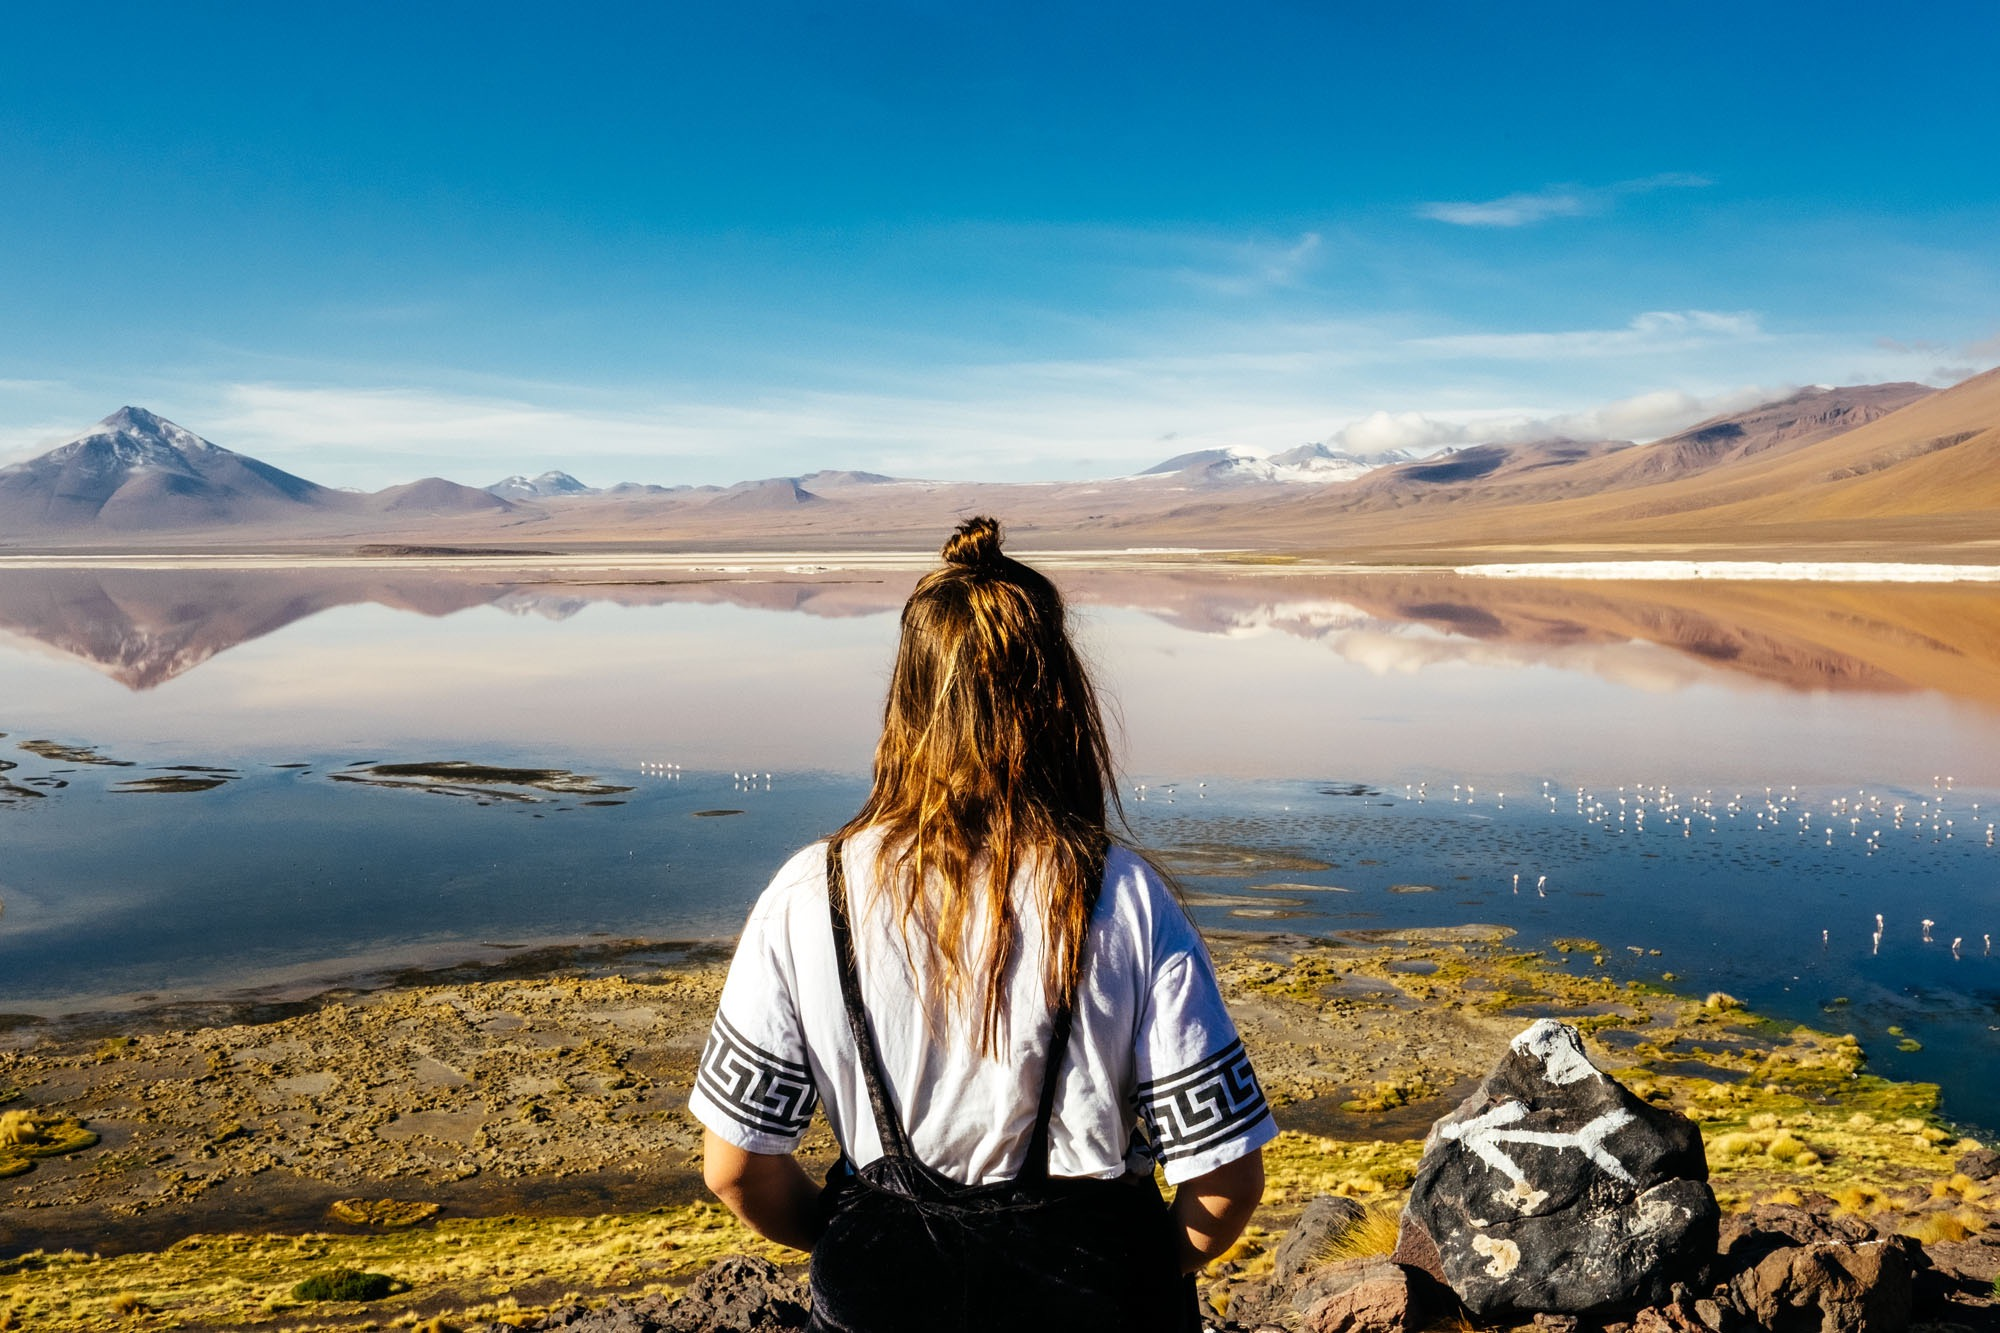 JenniferEmerling_Bolivia_Southwest13.jpg